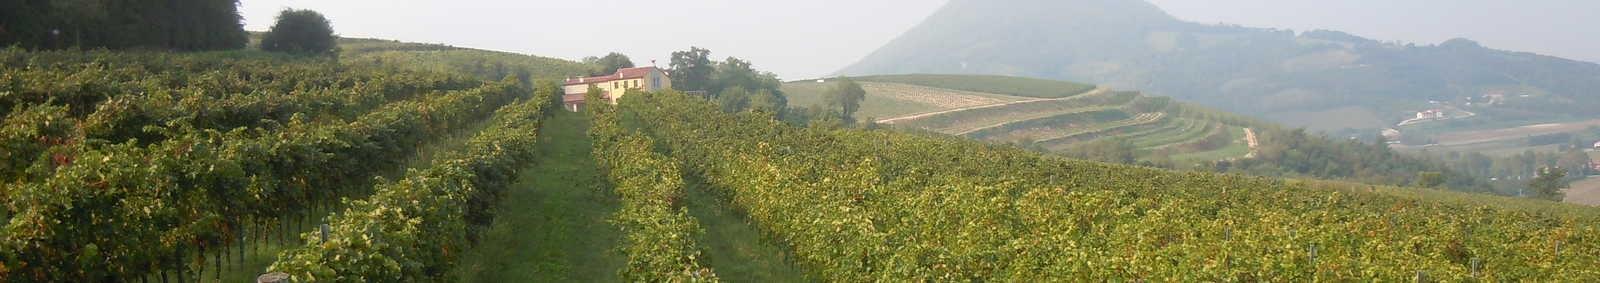 Cortela to Arqua Petrarca walk